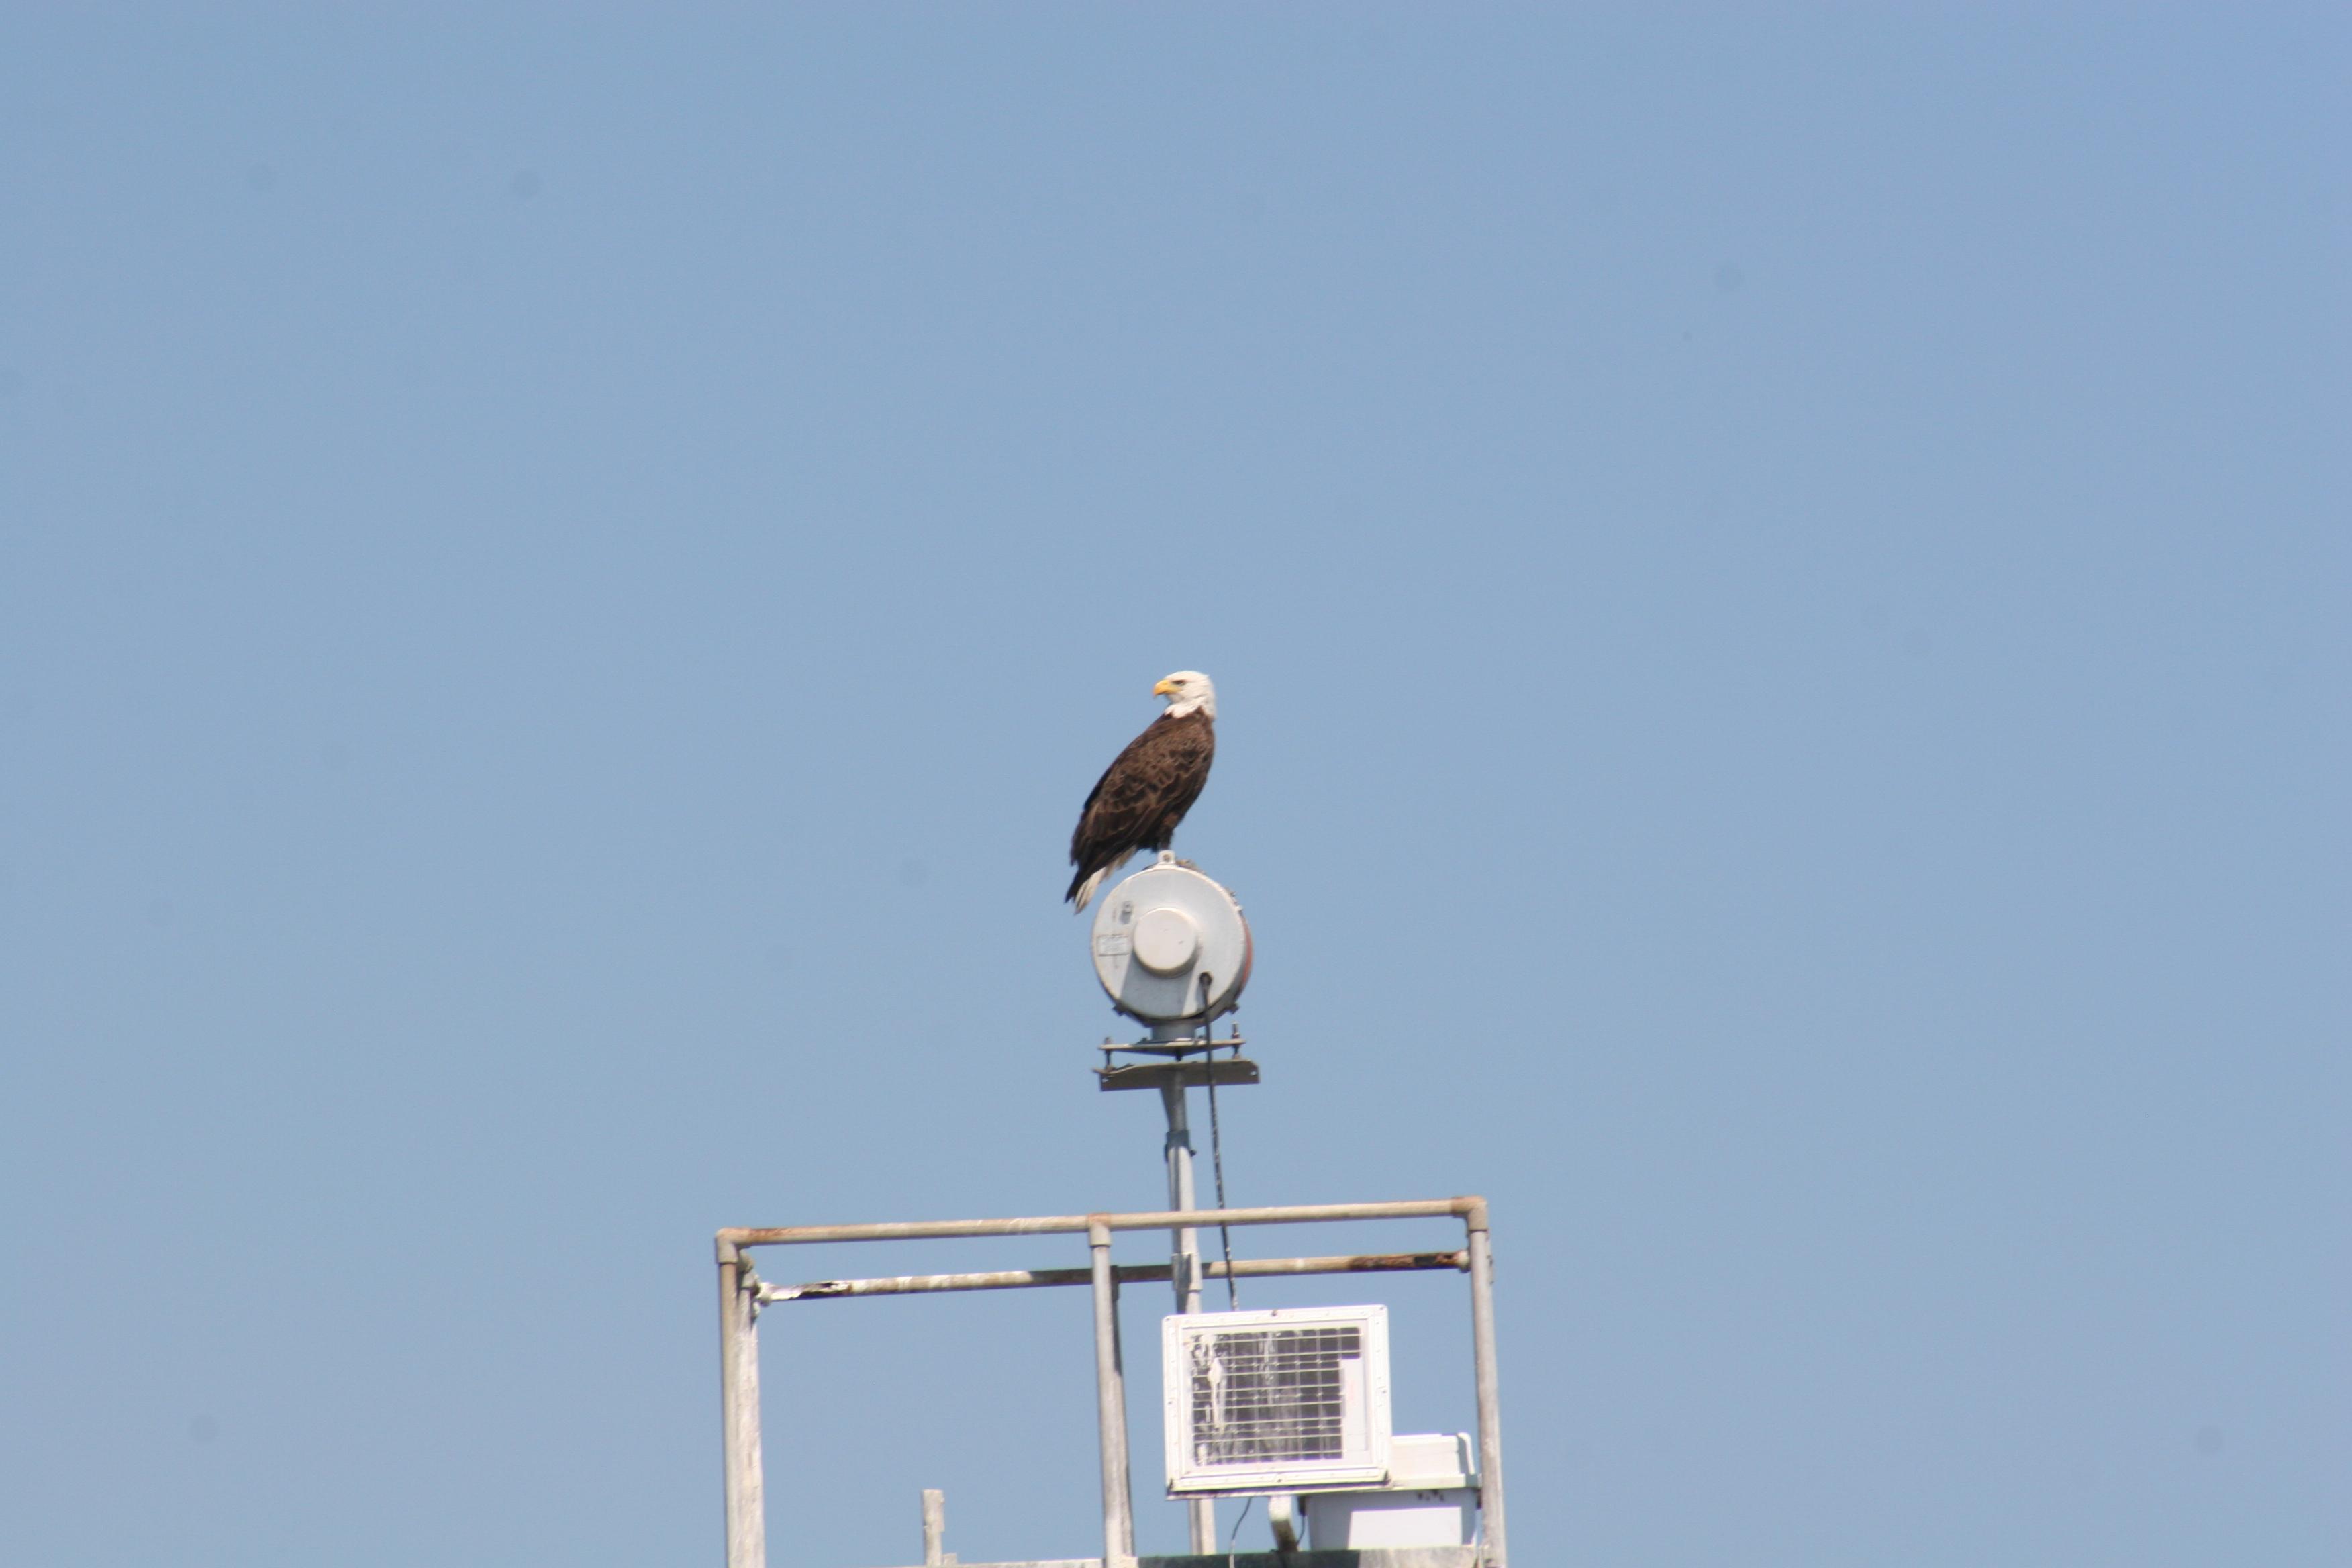 2012-03-15-eagle-icw-002